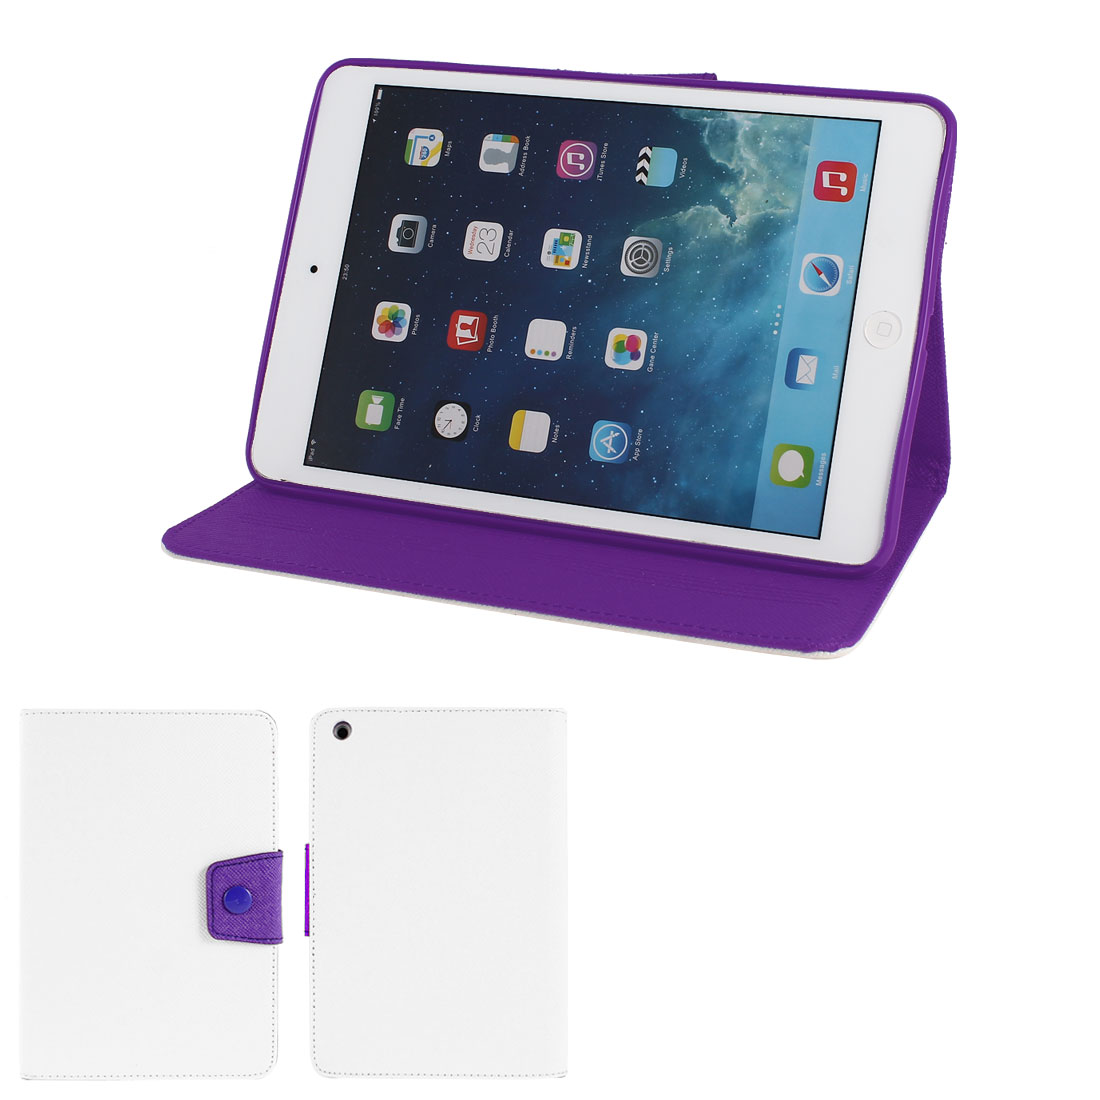 White PU Leather Purple Silicone Holder Folio Flip Stand Case Cover for iPad Mini